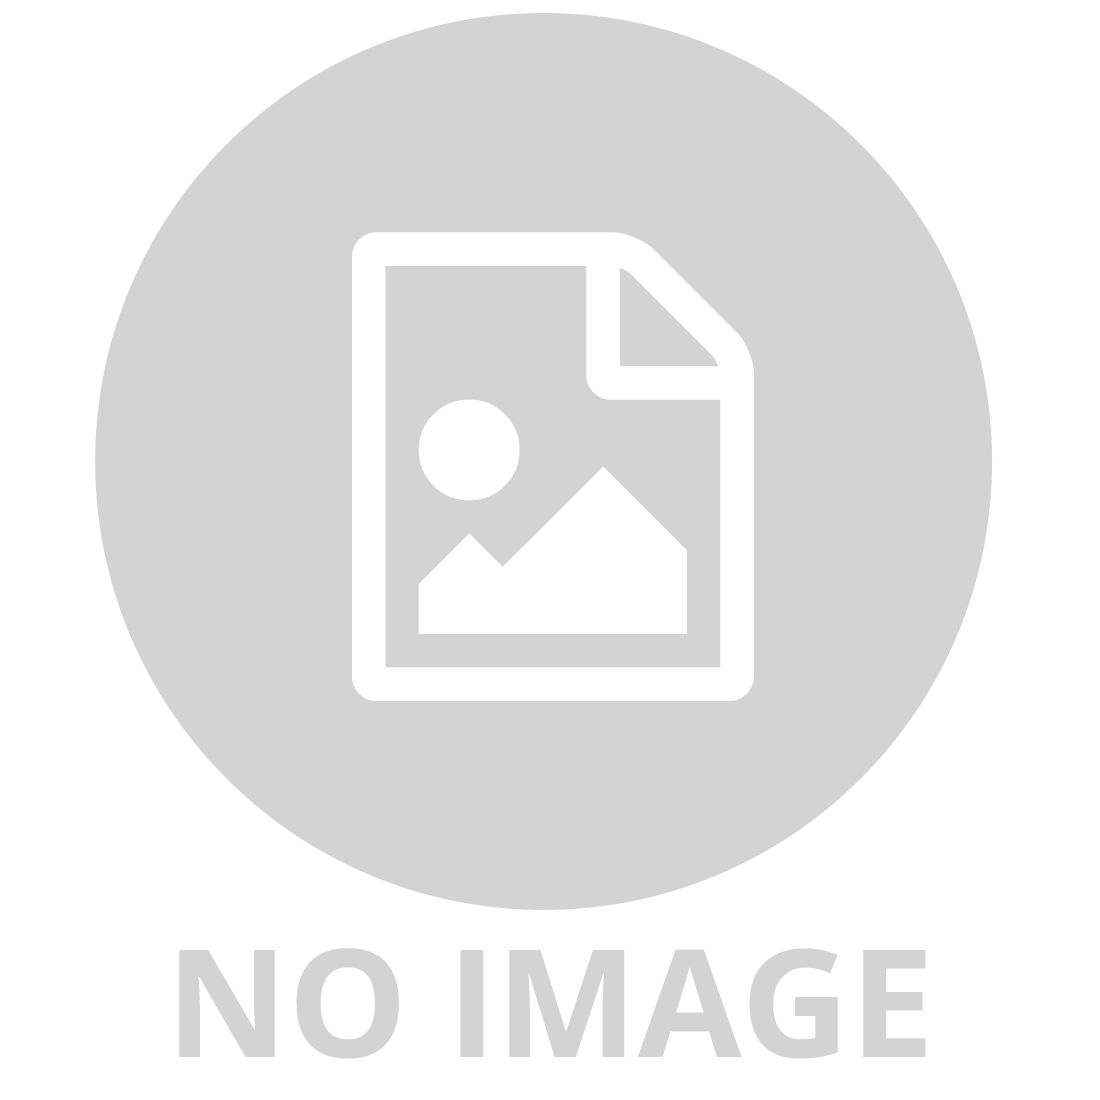 HEXBUG VEX ROBOTICS FORKLIFT